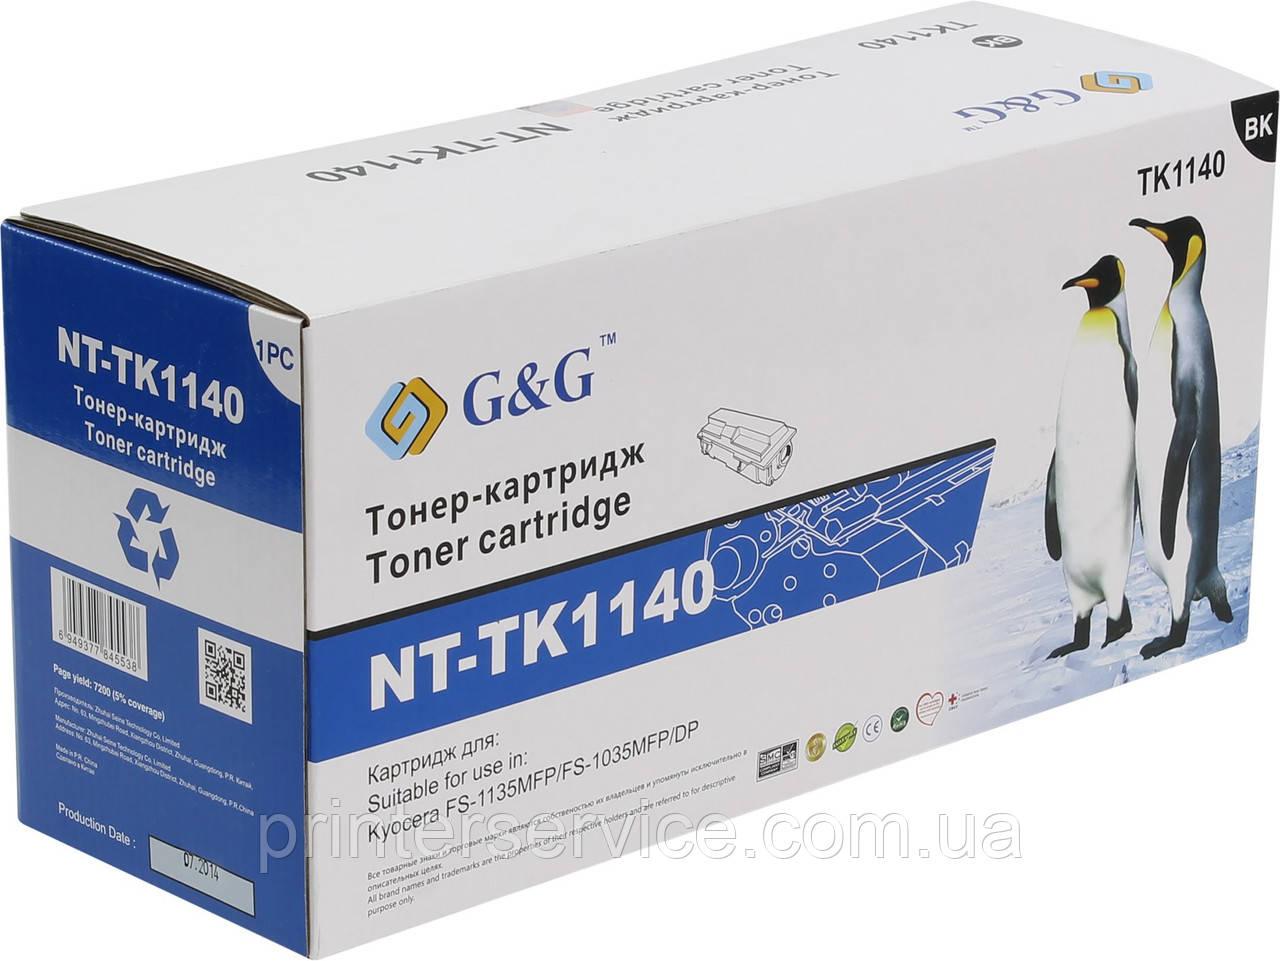 TK-1140 совместимый картридж (аналог) для Kyocera FS-1135/ 1035, G&G-TK1140 black